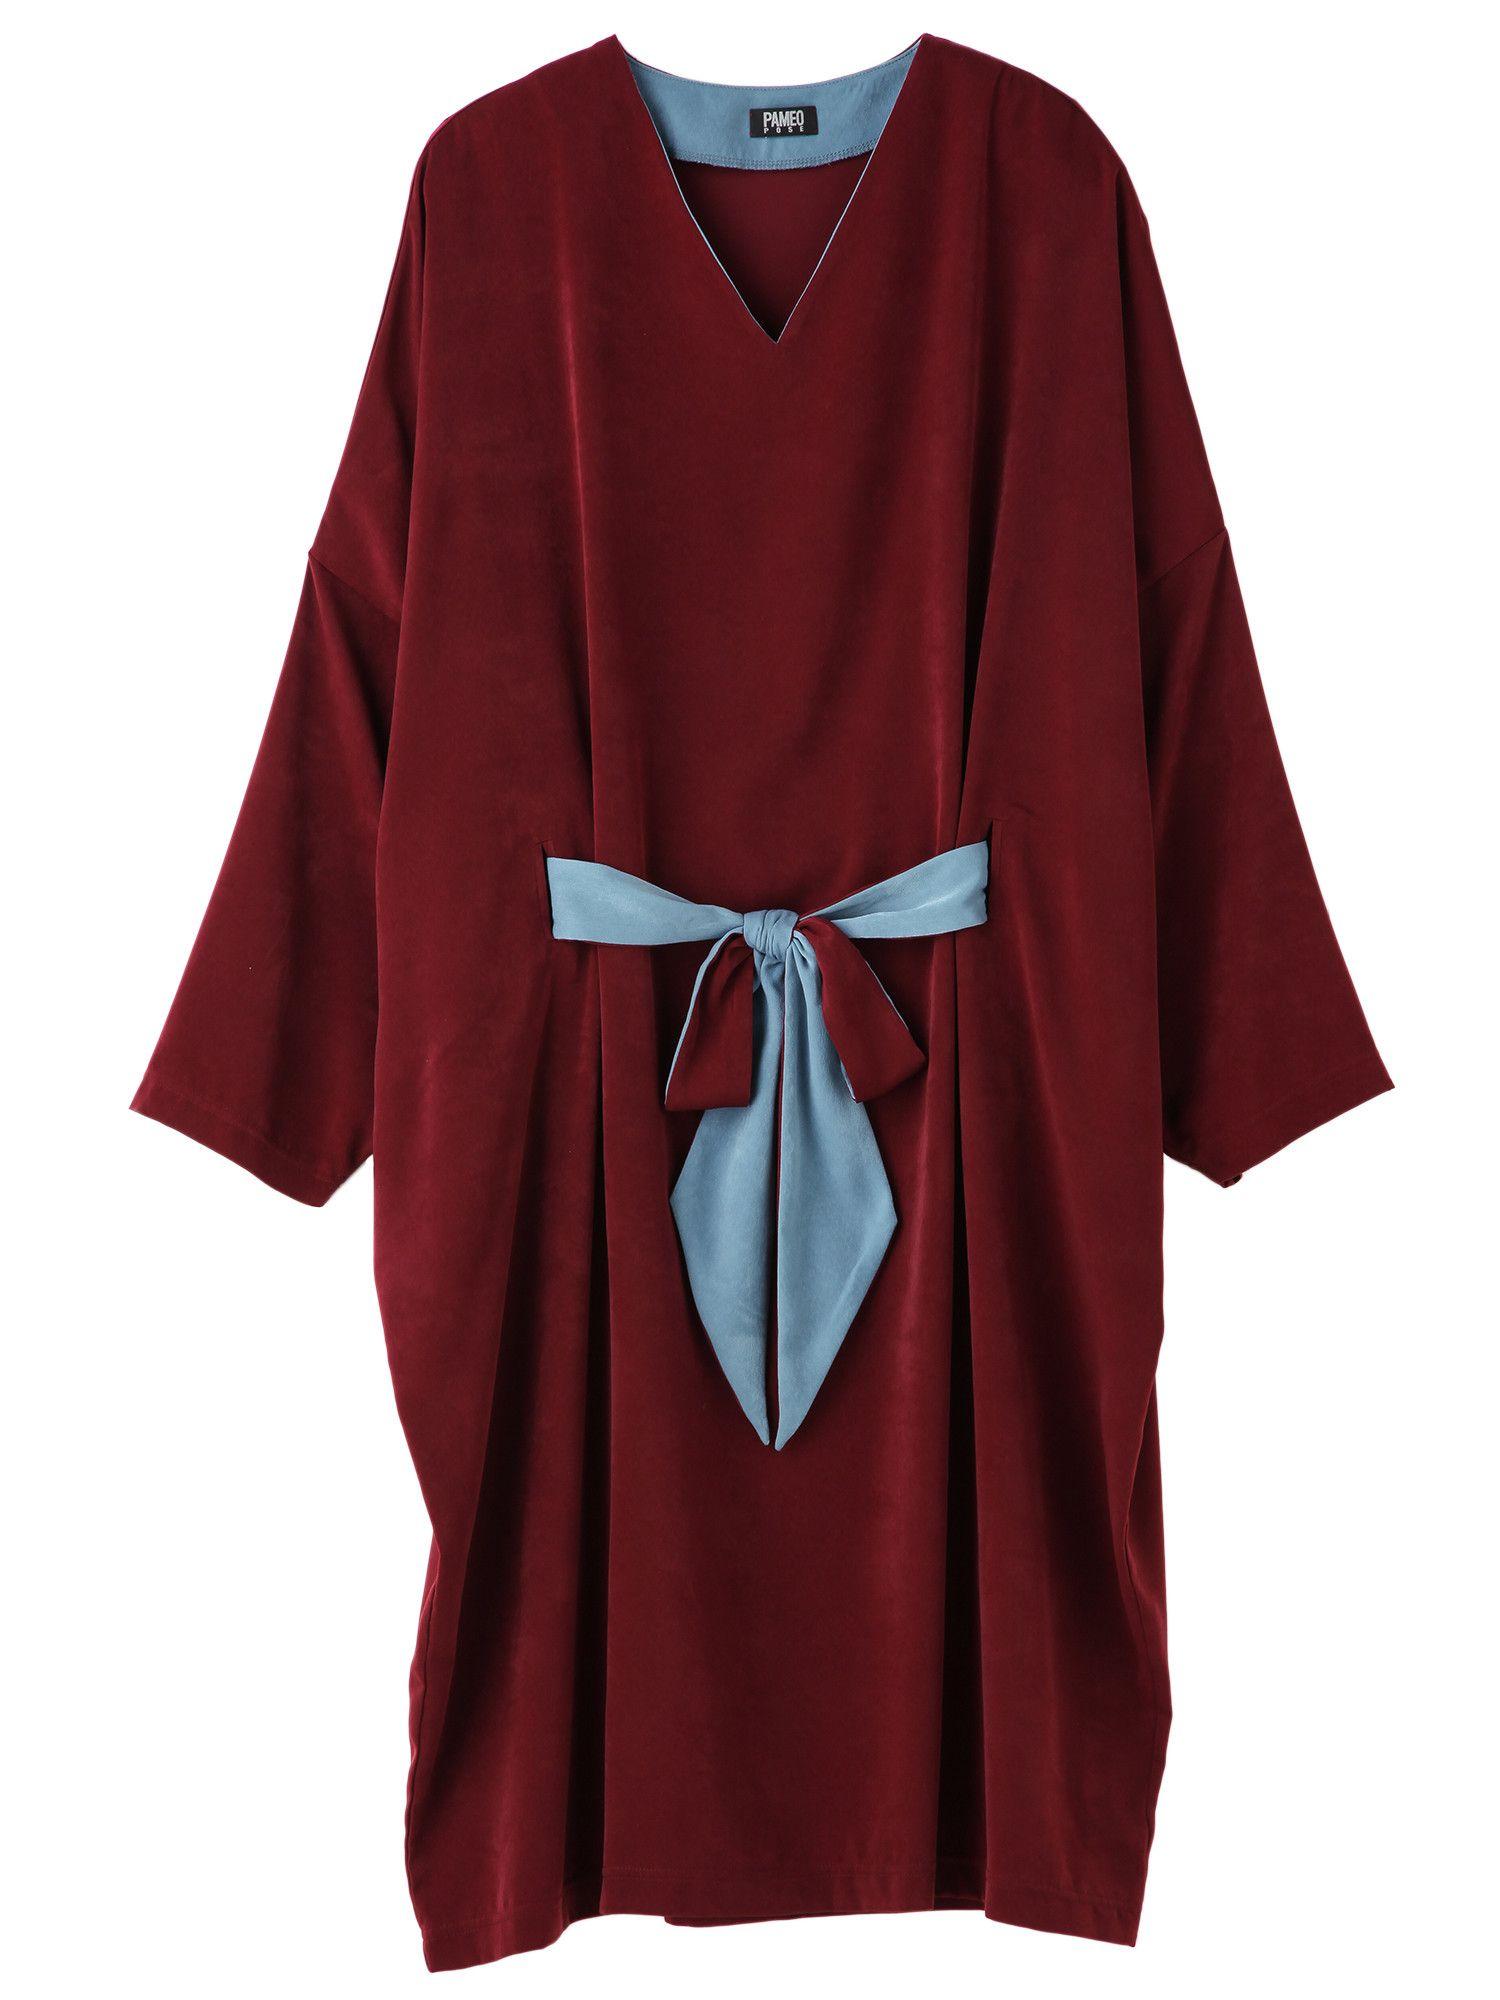 Satin Cocoon Dress